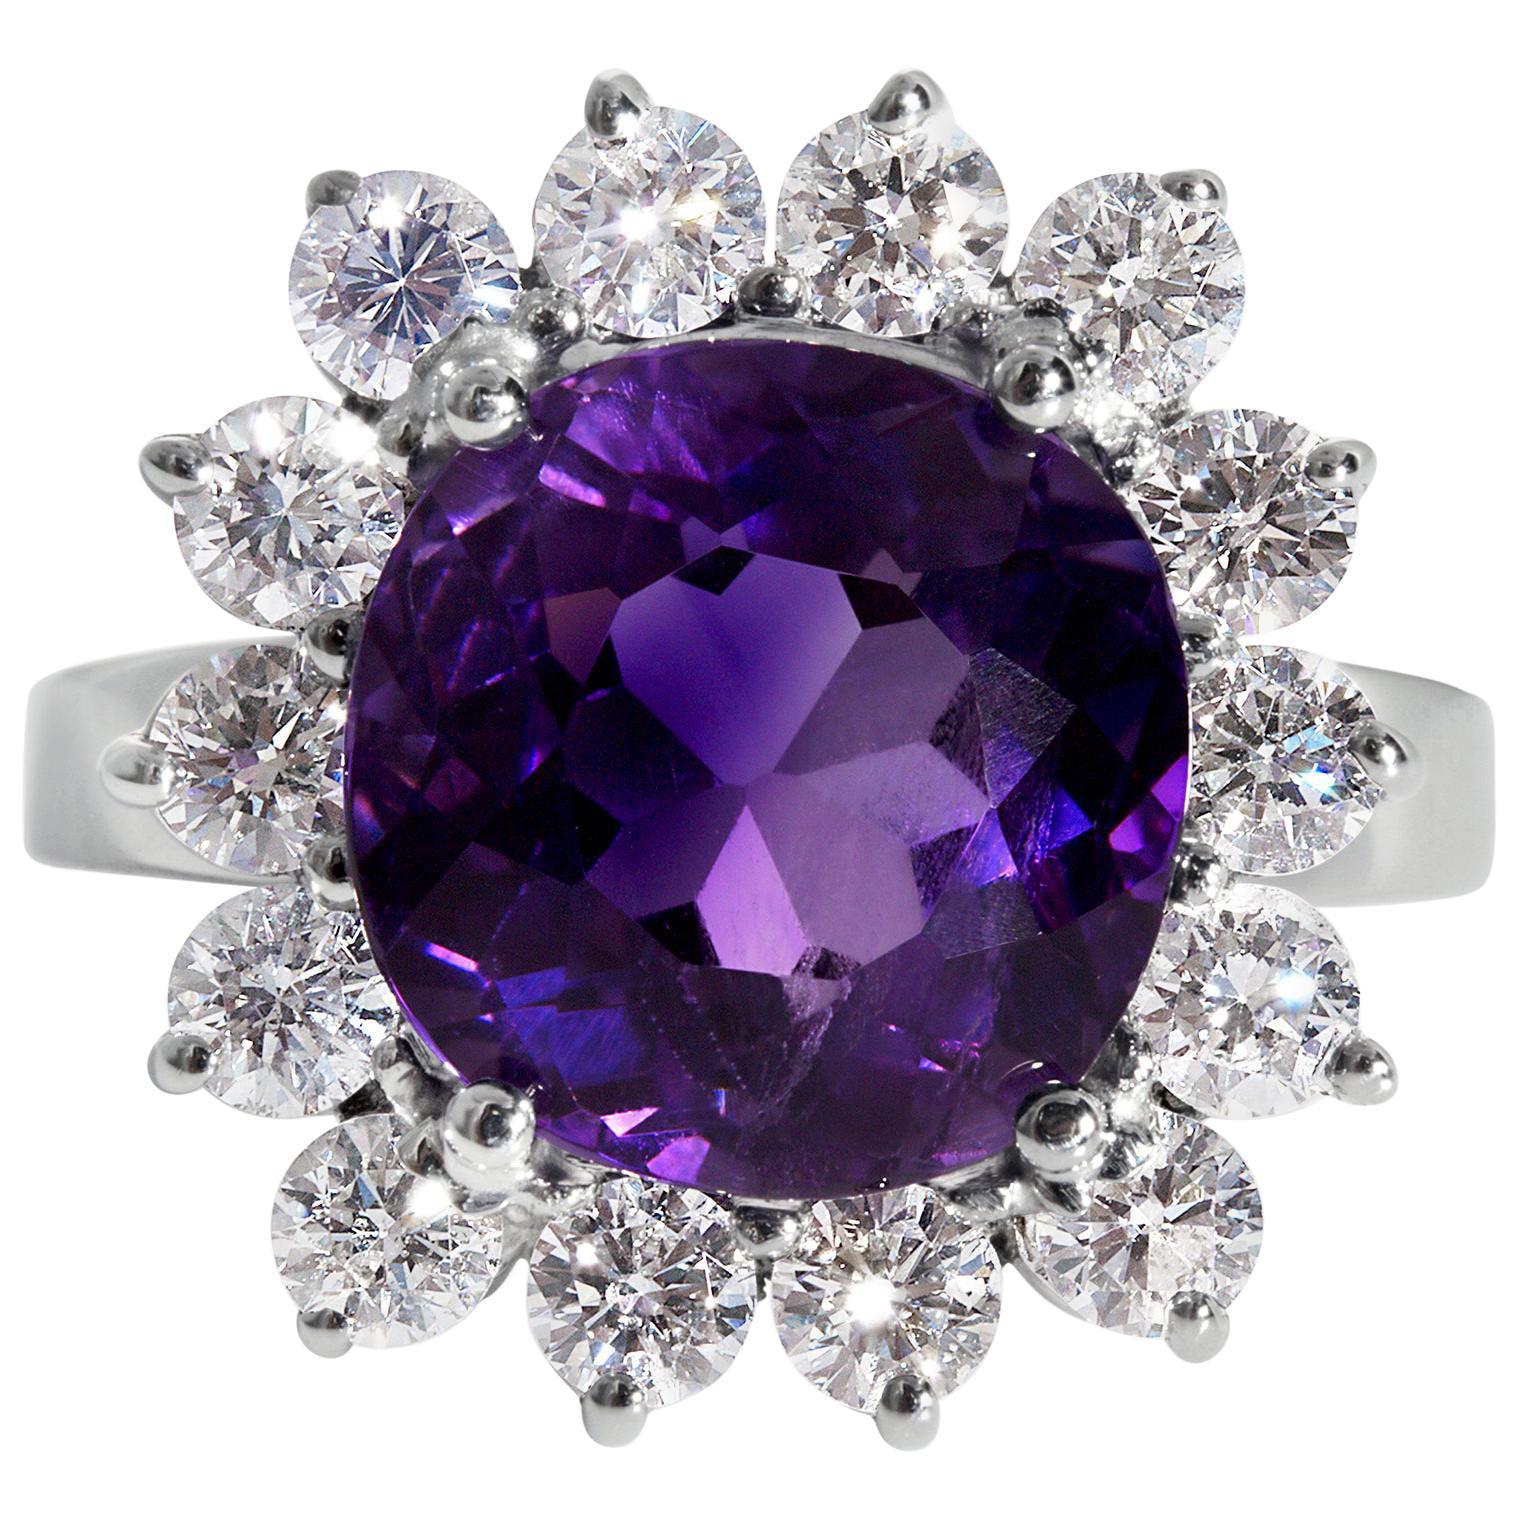 Estate 8.18 Carat Deep Purple Natural Amethyst Diamond Cluster Vintage Ring